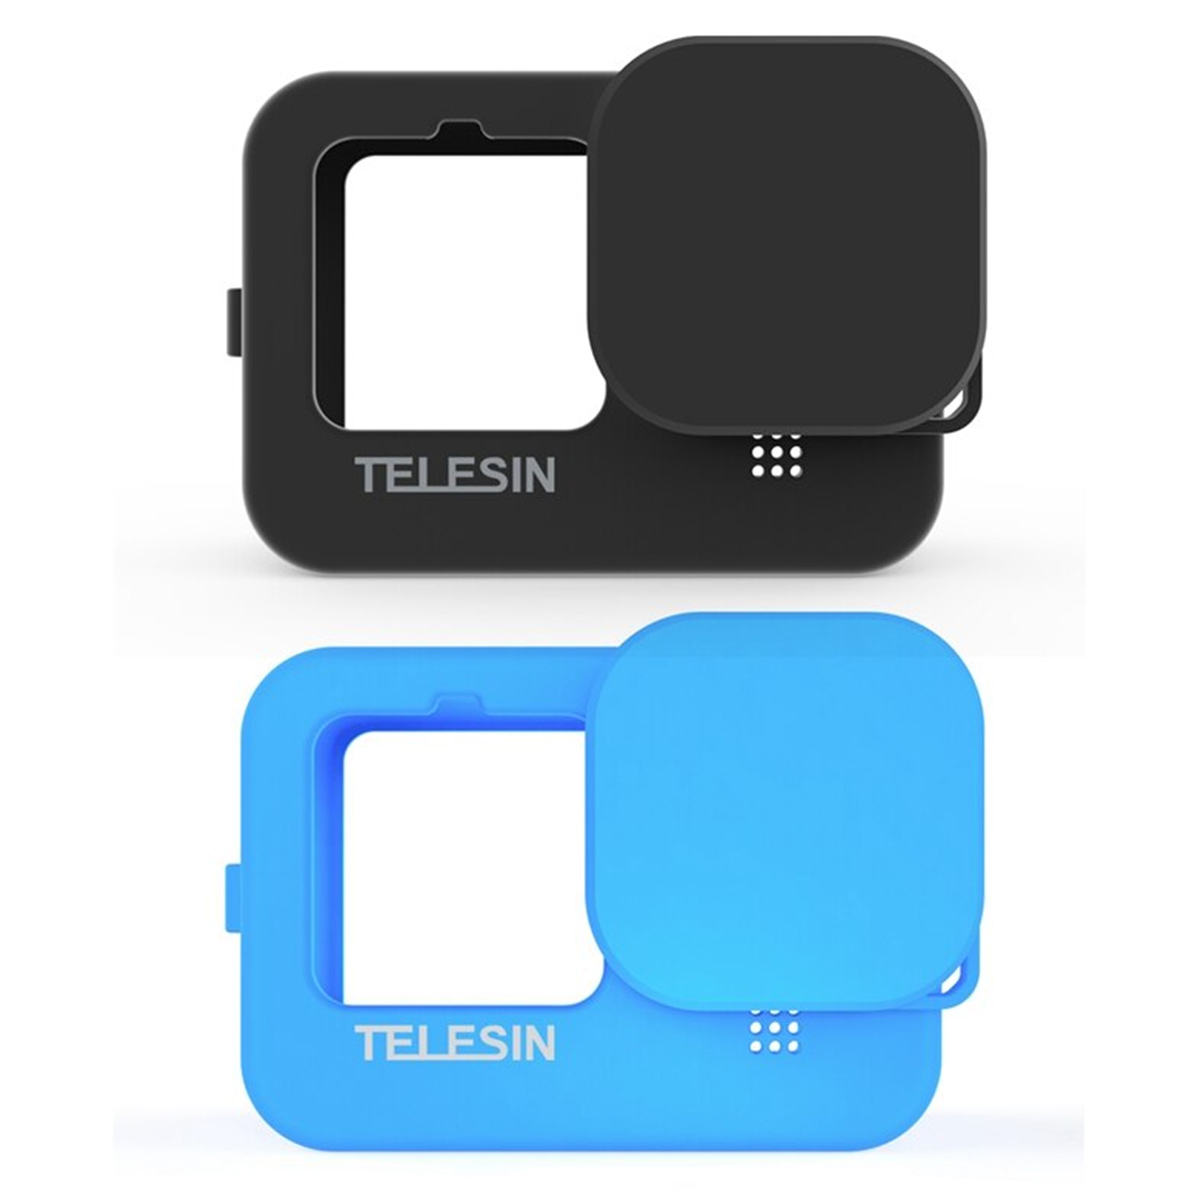 Capa Protetora de Silicone para GoPro Hero9 e Hero10 Black - Telesin